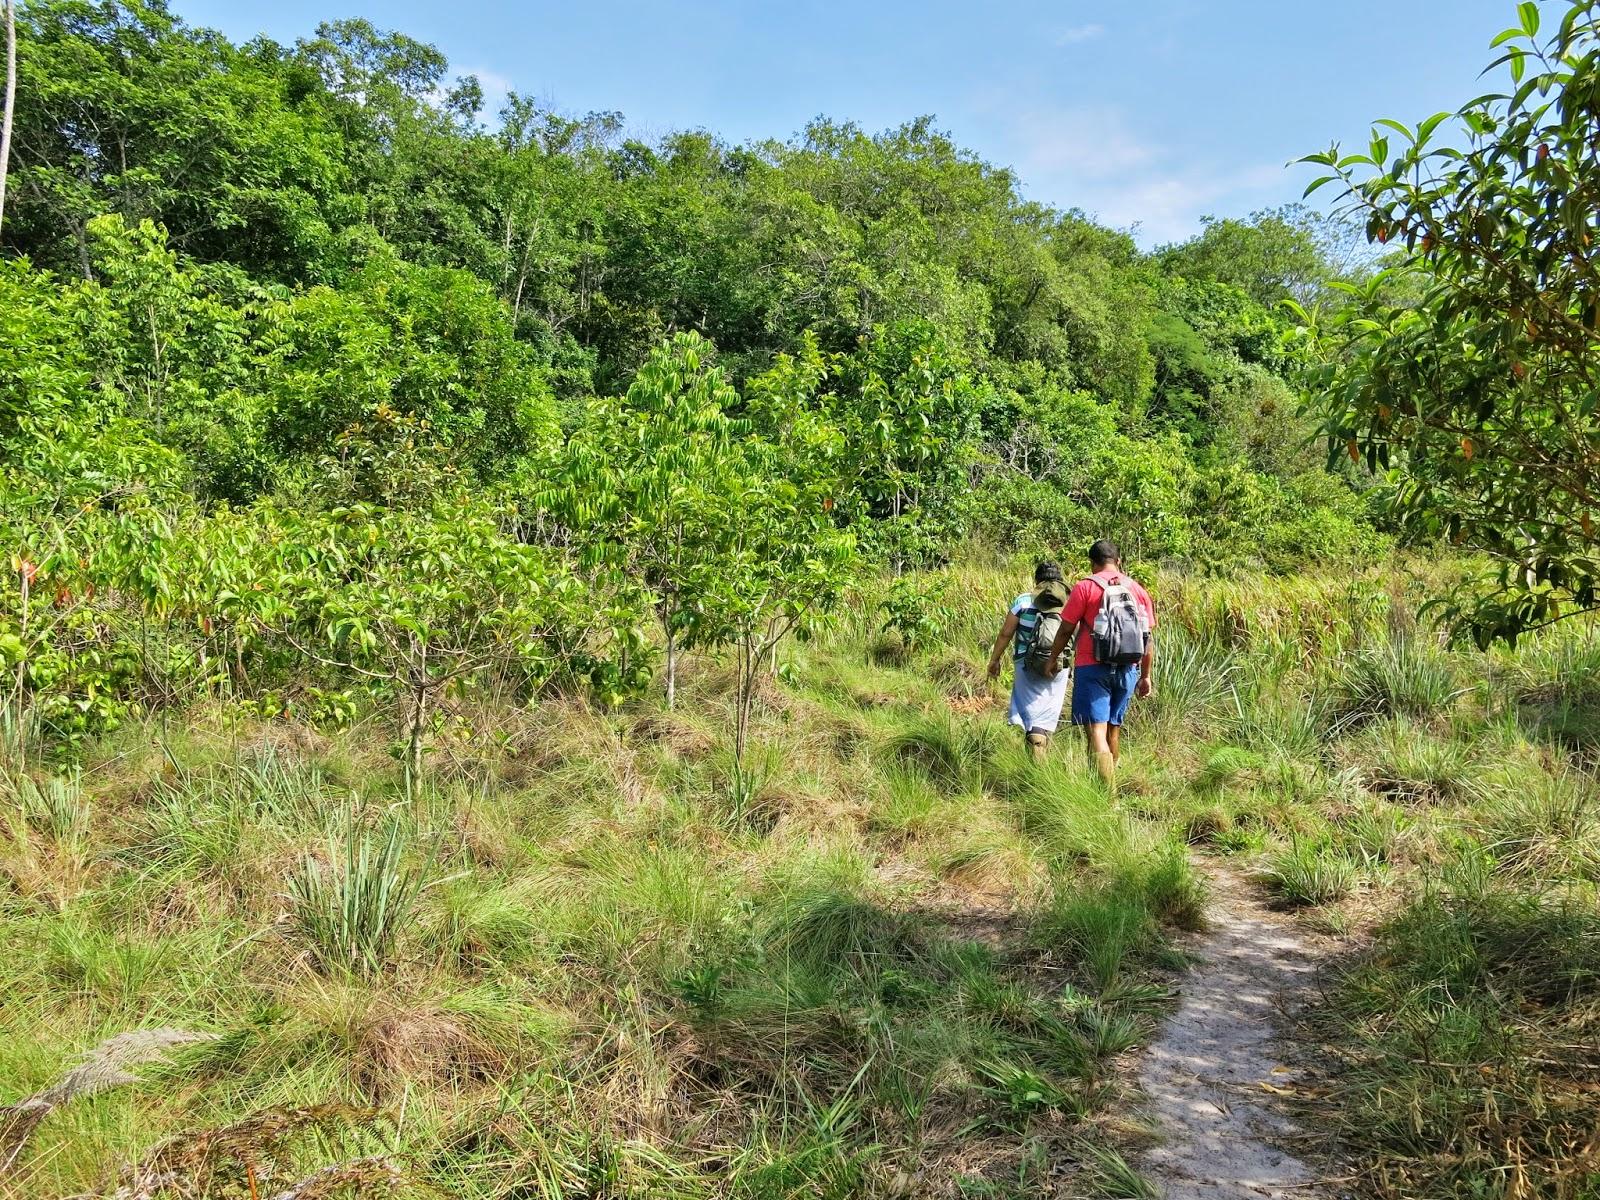 Trilha para a Caverna Aroe-Jari e Lagoa Azul, na Chapada dos Guimarães.